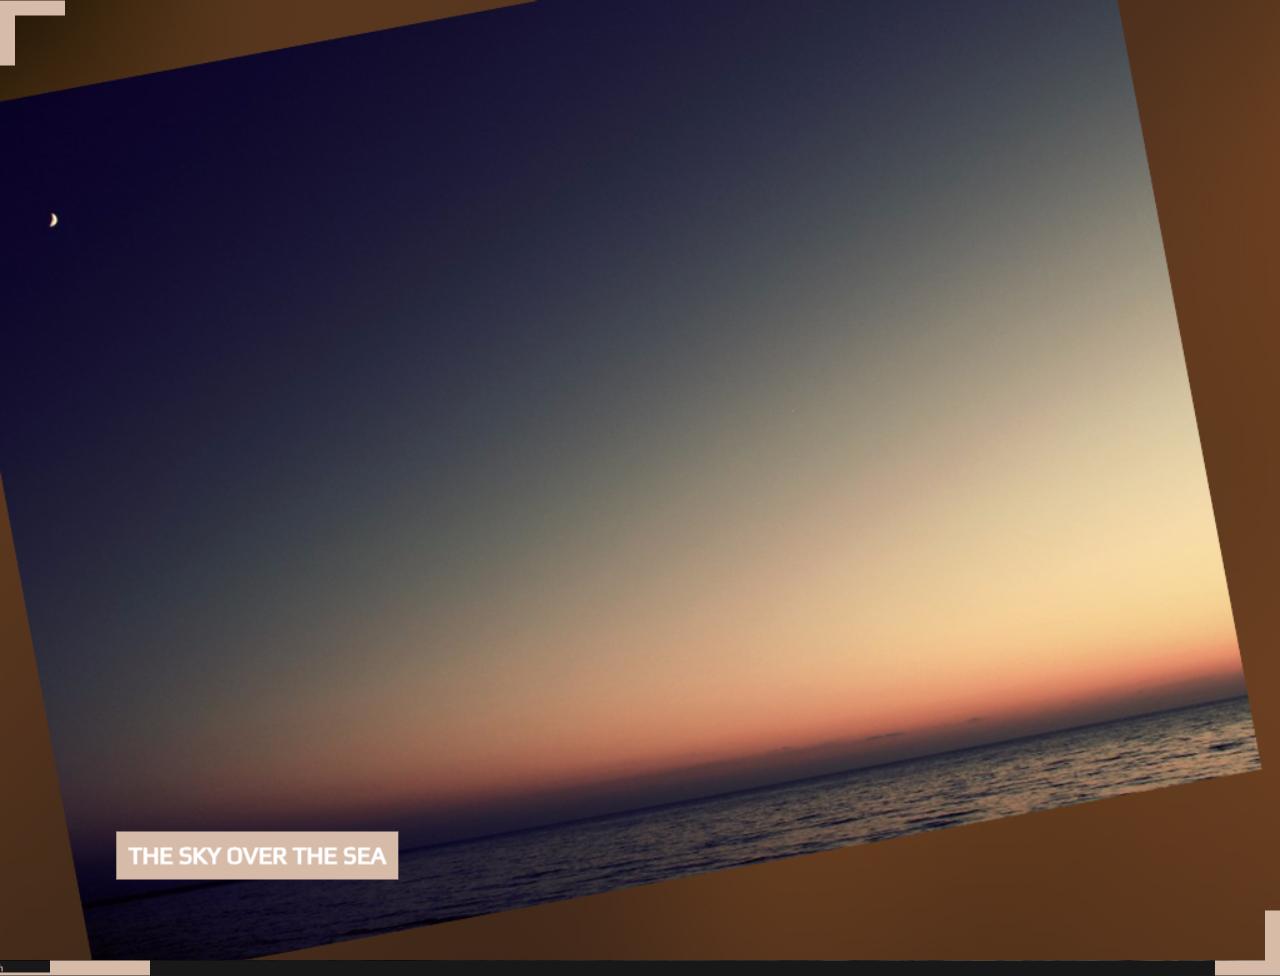 CSS3 Image Carousel